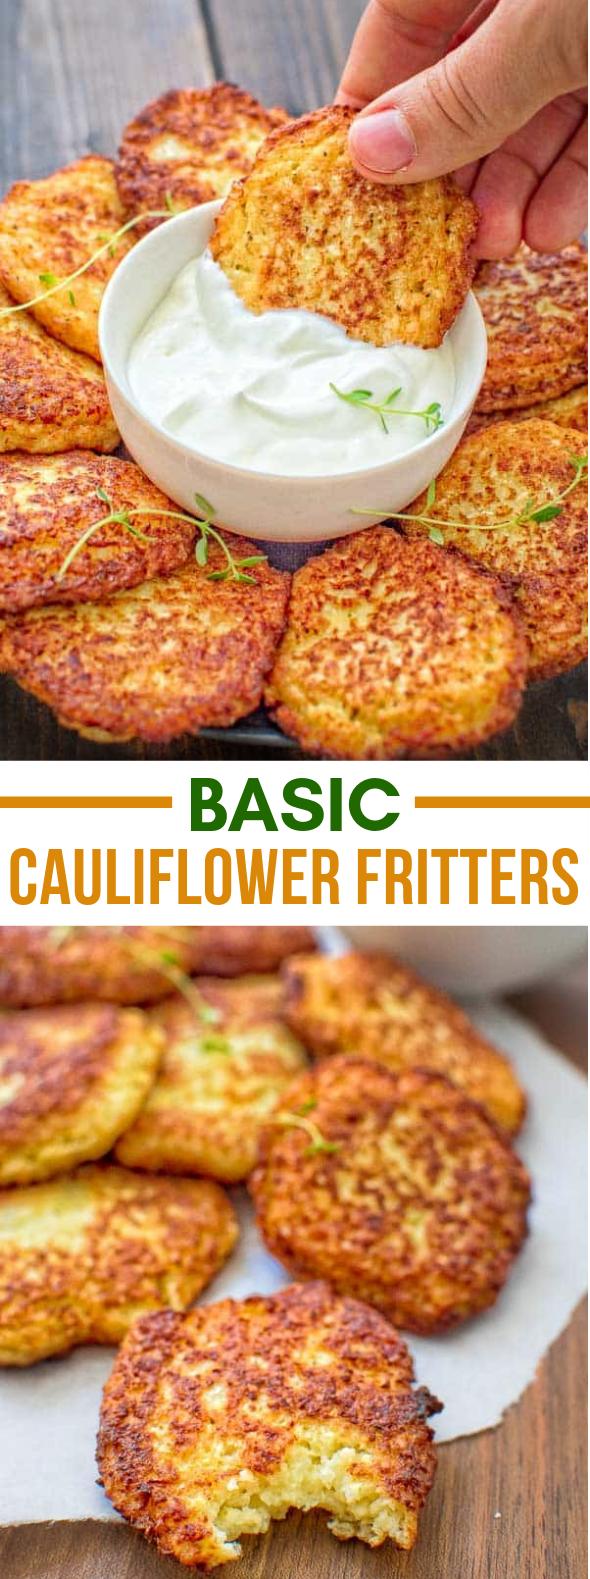 BASIC CAULIFLOWER FRITTERS #vegetarian #cooking